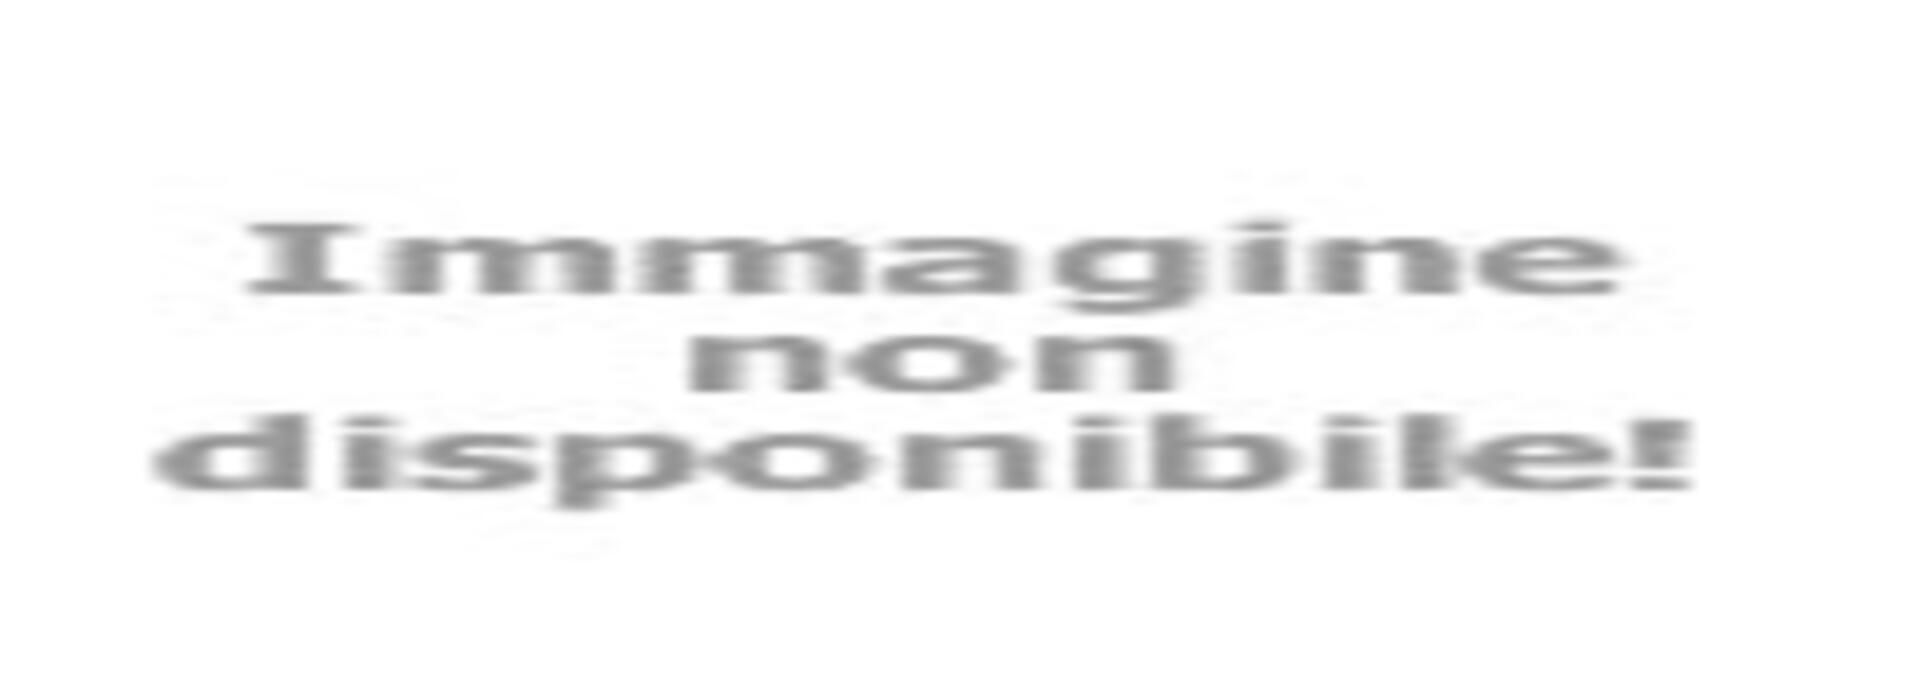 hotel-montecarlo pl 5-wod 019